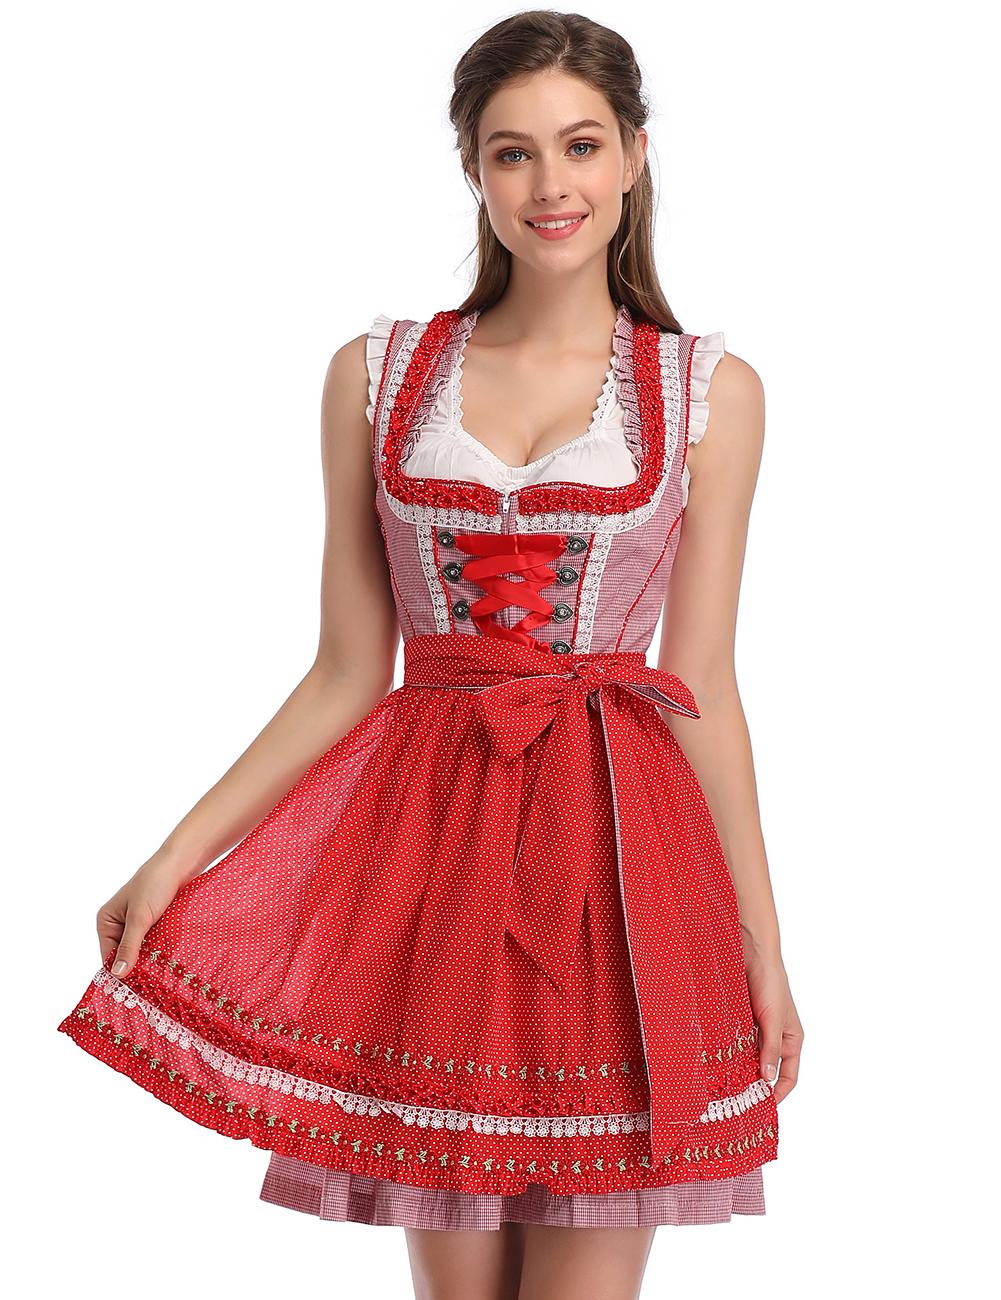 [EU Direct] KOJOOIN Women's German Dirndl Dress Costumes Set for Bavarian Oktoberfest Halloween Carnival